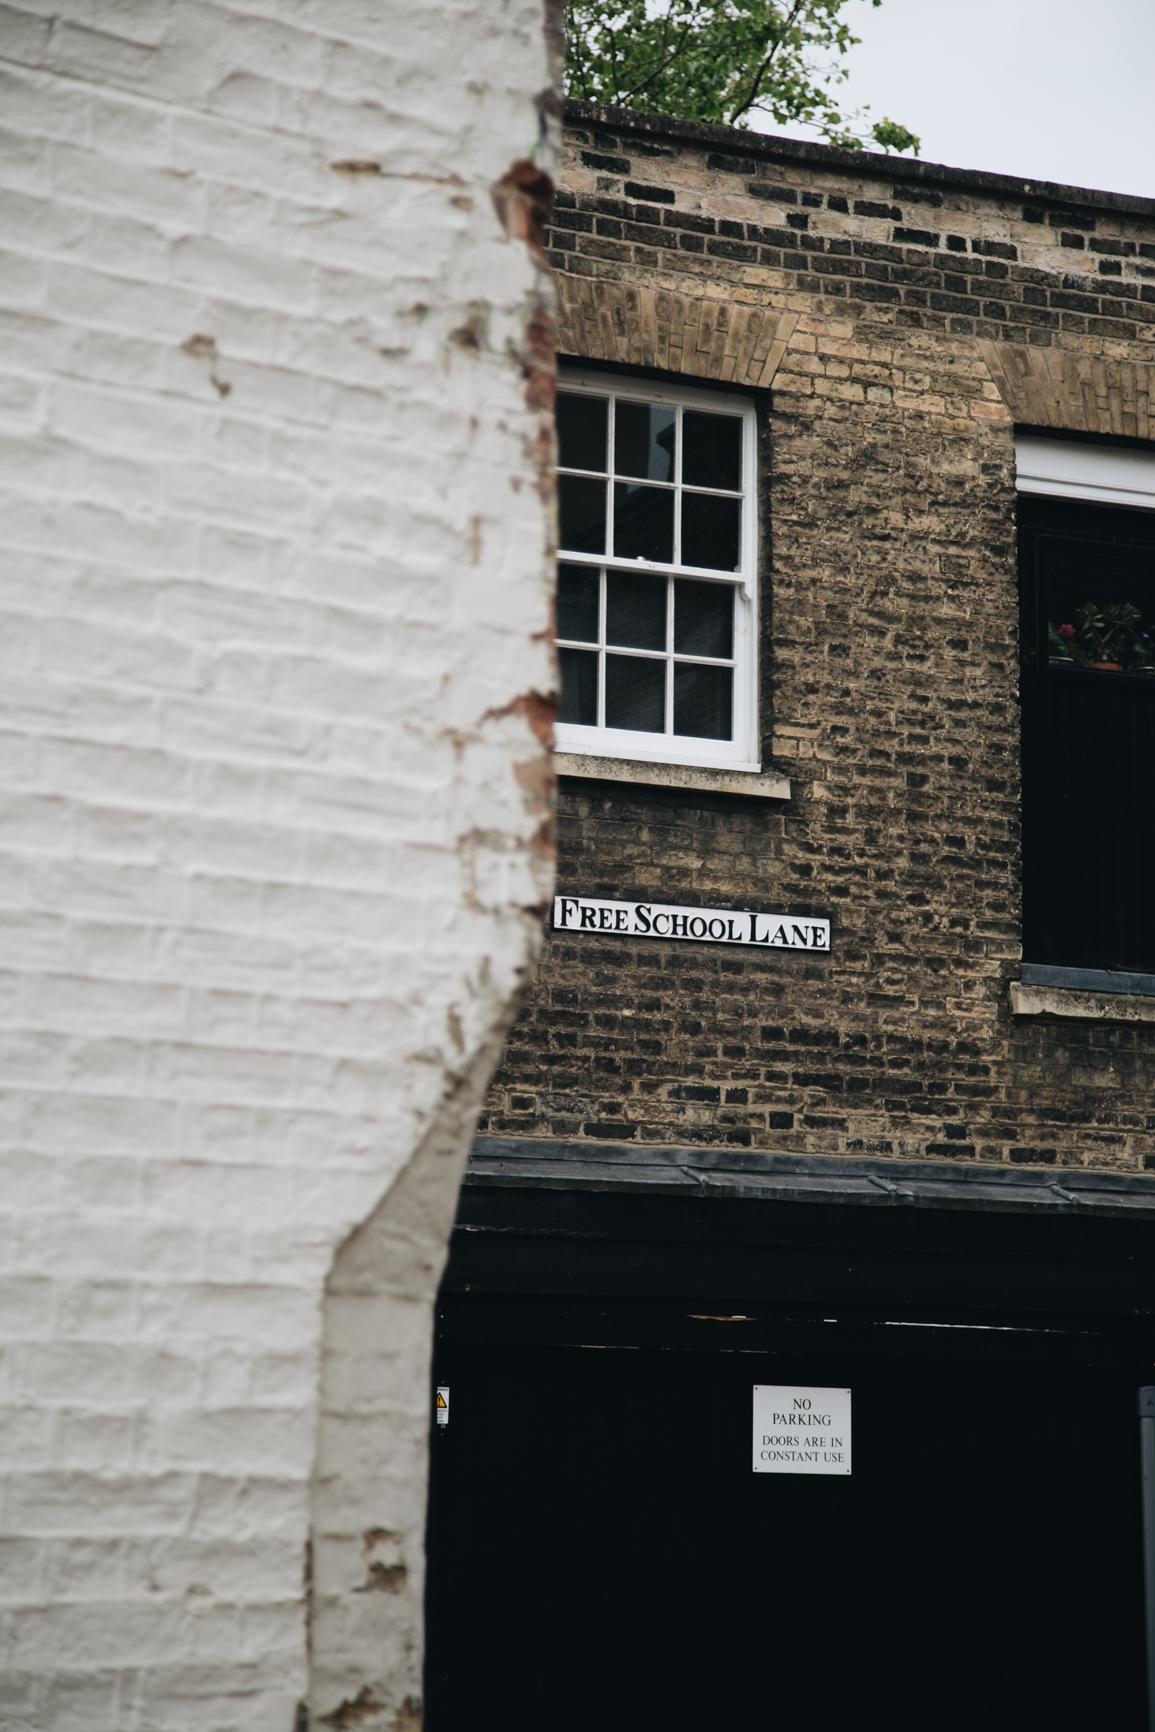 cambridge-visite-guidee.jpg